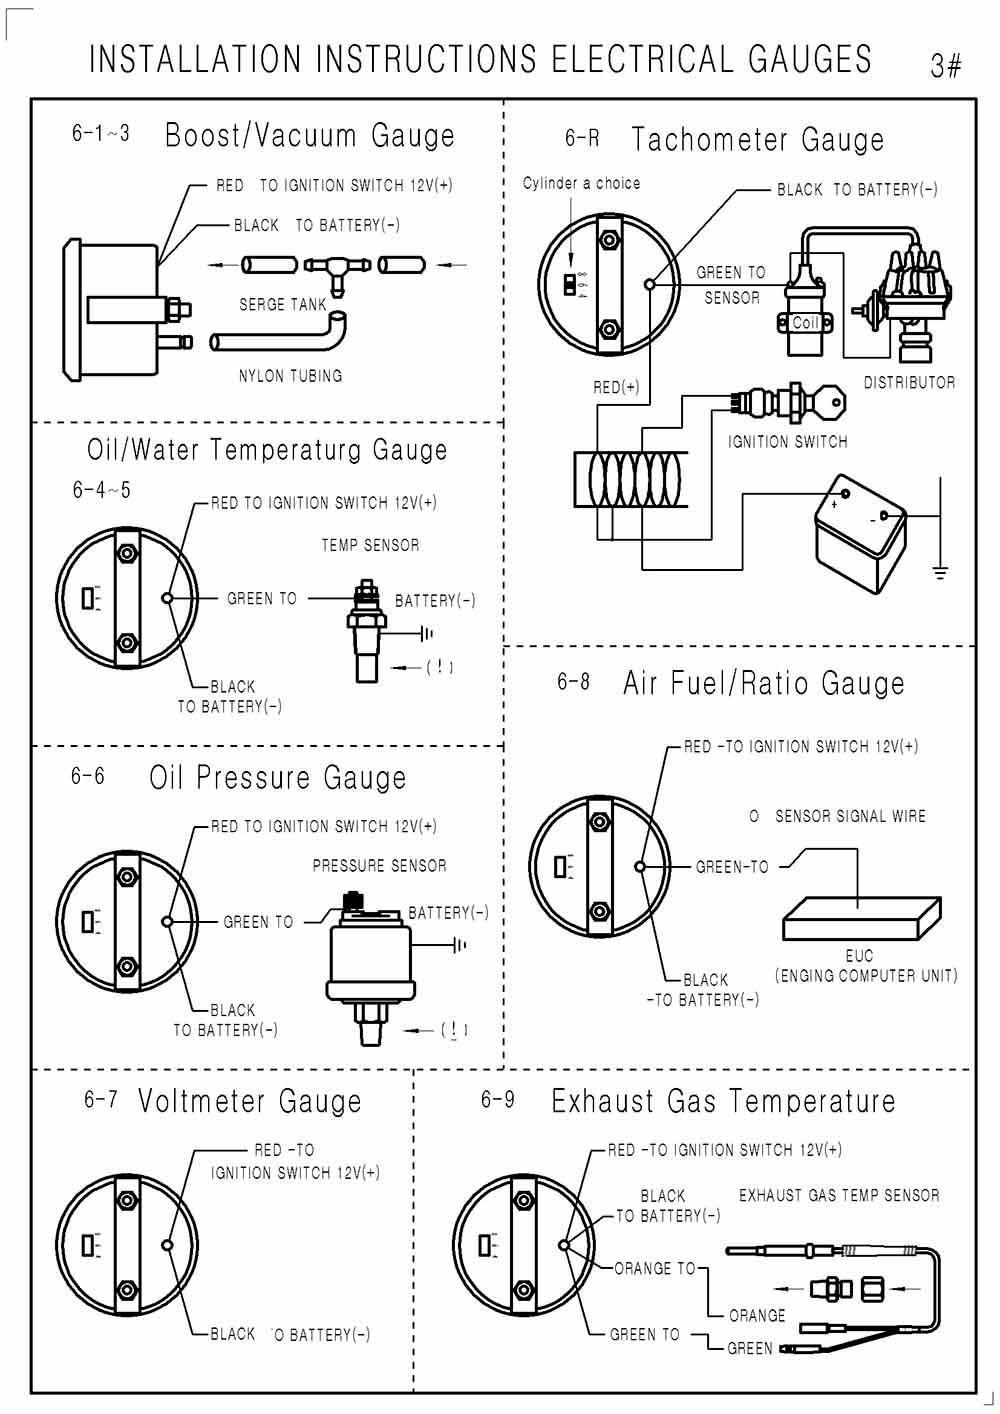 Dragon Tach Wiring Diagram - Case Sc Wiring Diagram -  mazda3-sp23.yenpancane.jeanjaures37.fr | Dragon Tach Wiring Diagram |  | Wiring Diagram Resource